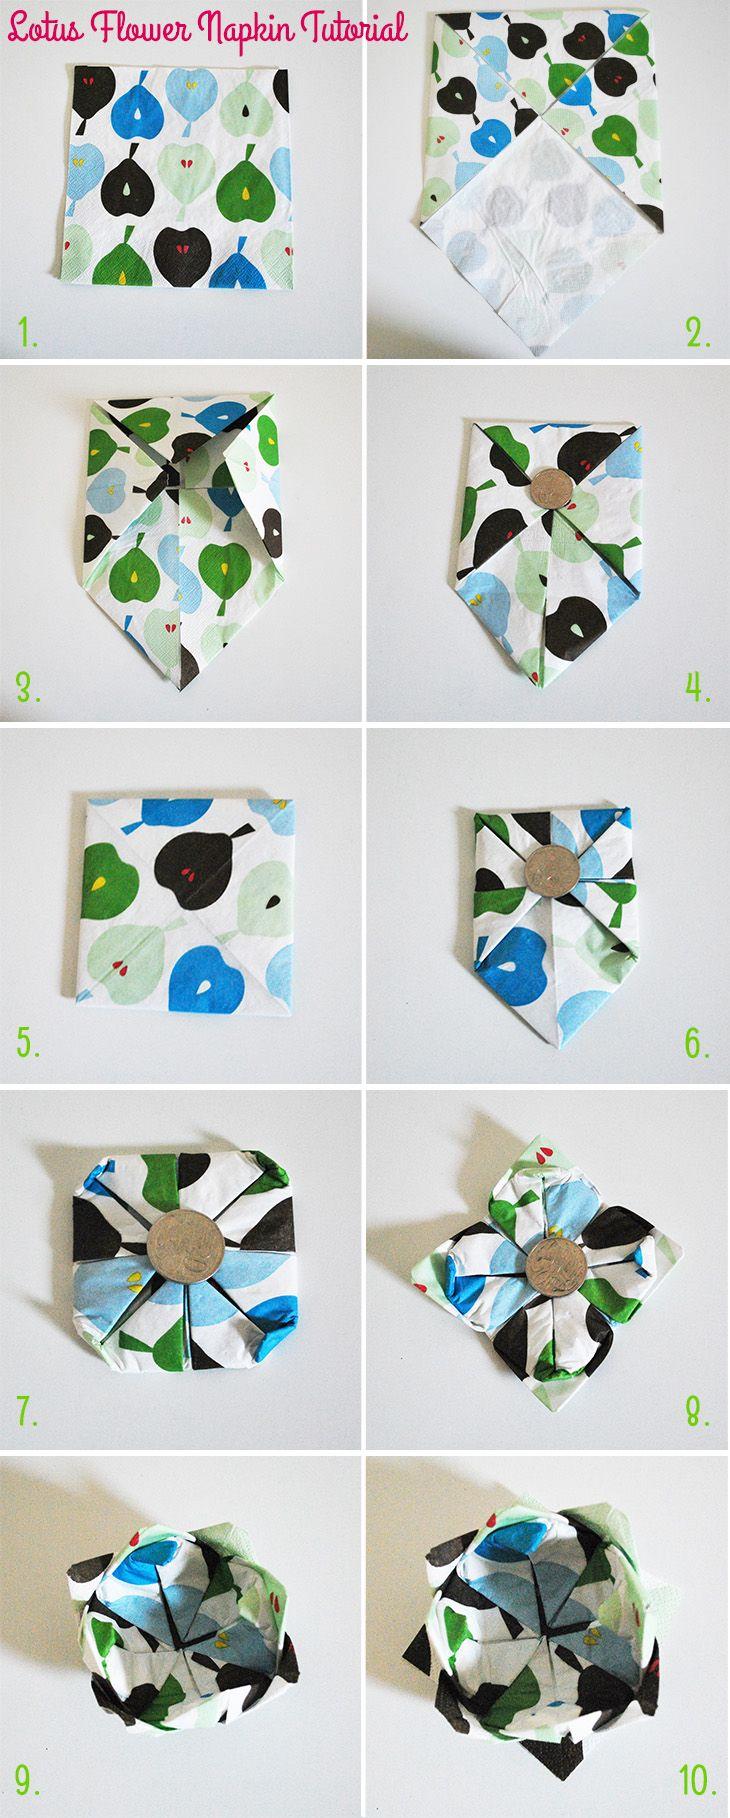 diy lotus flower napkin tutorial on style for a happy. Black Bedroom Furniture Sets. Home Design Ideas